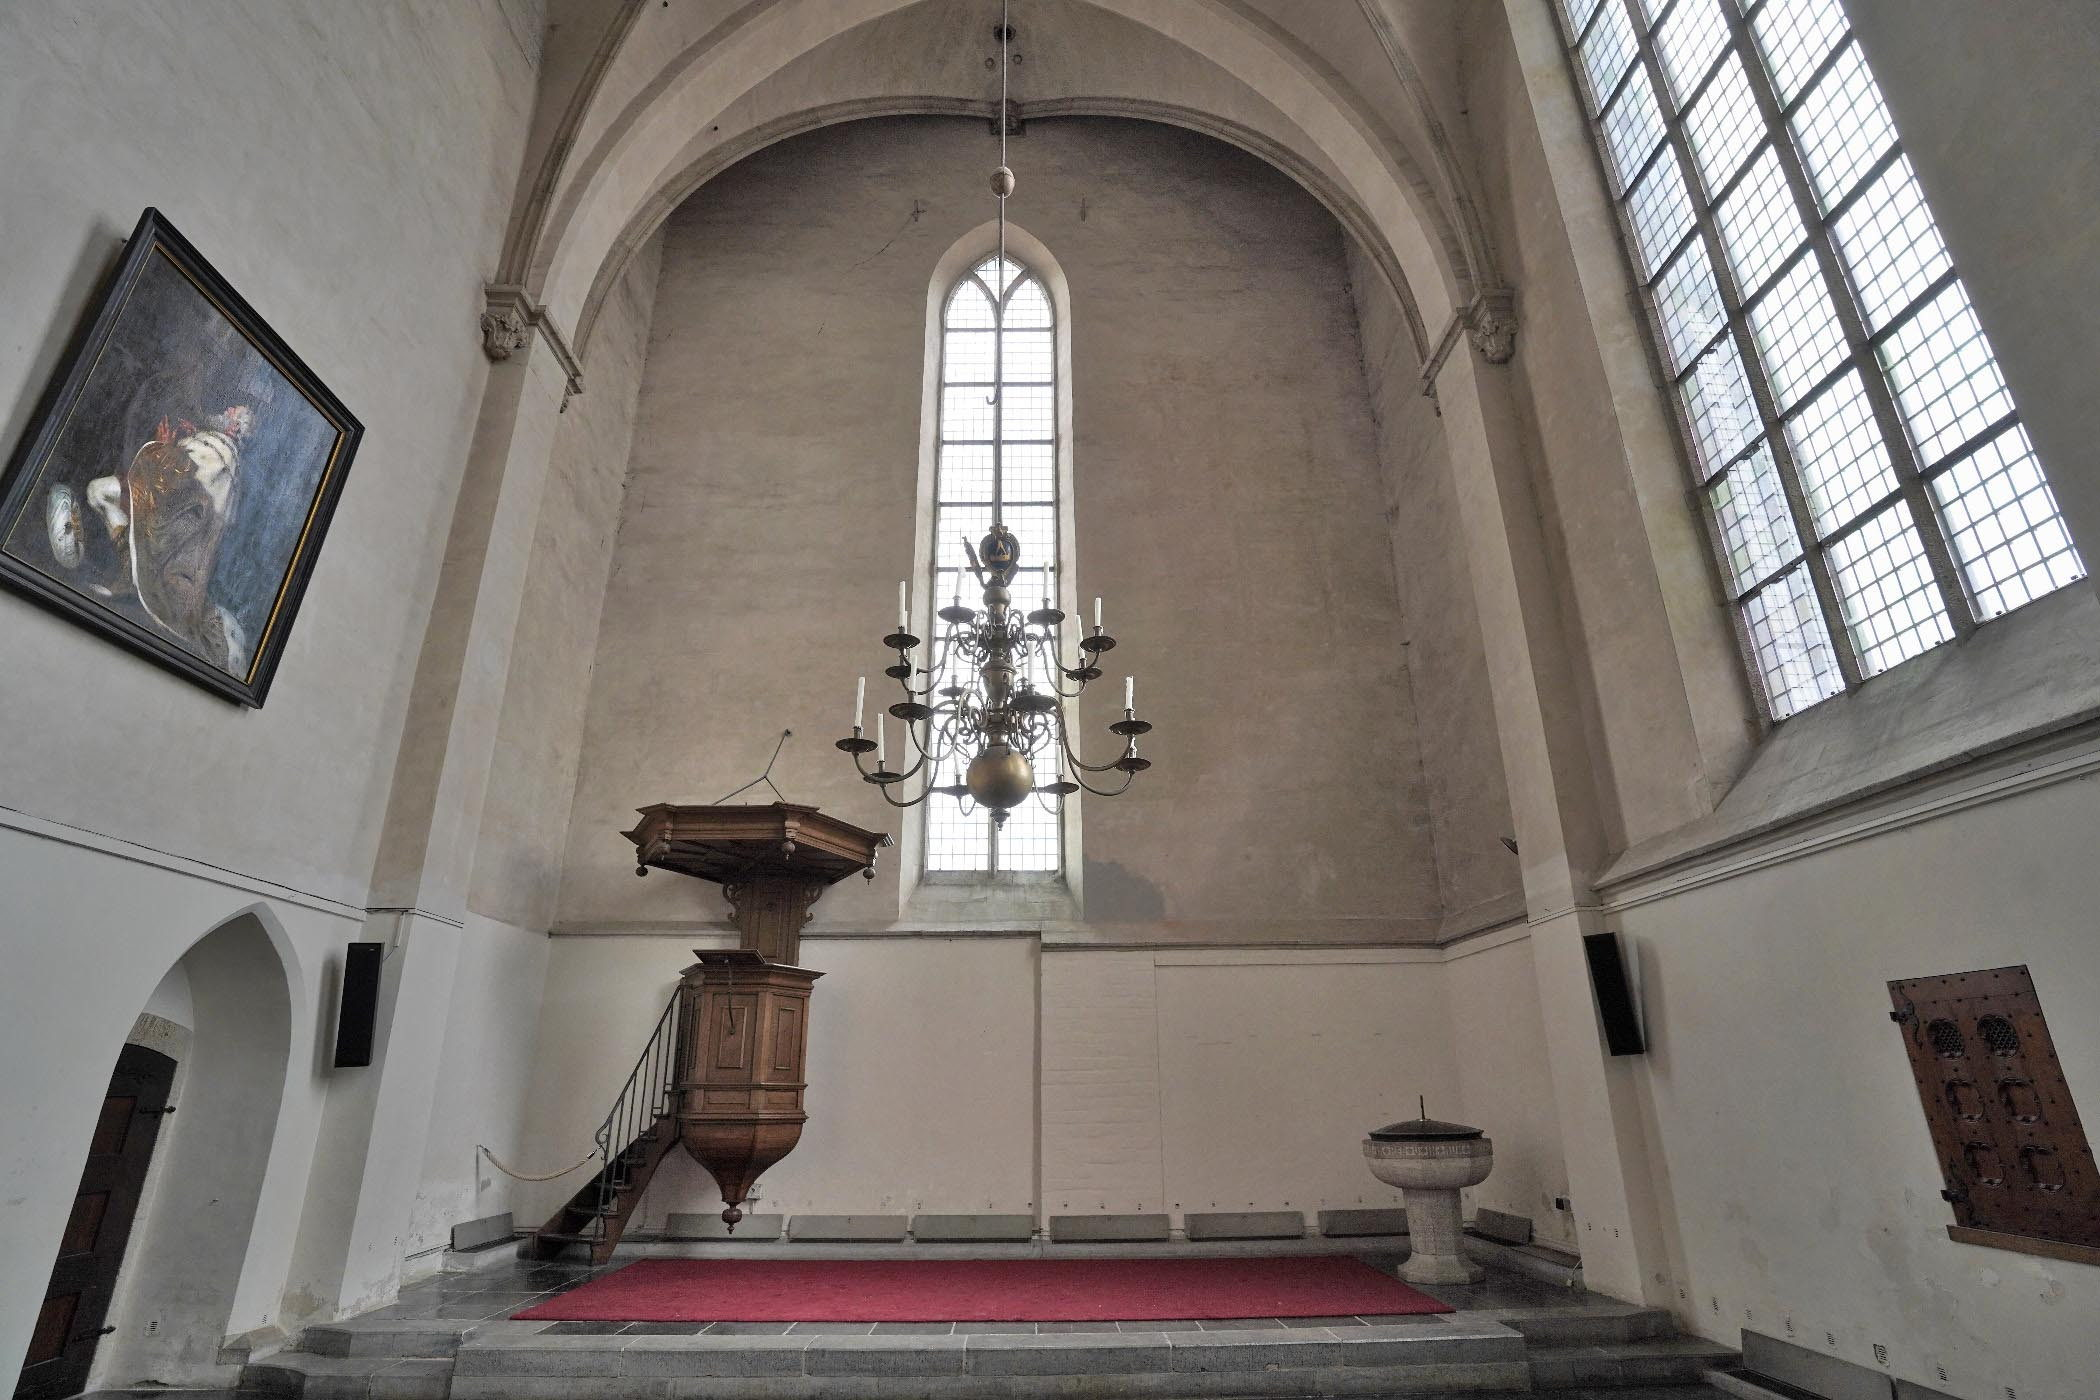 Noorderkapel Stevenskerk gezien vanuit de kerk